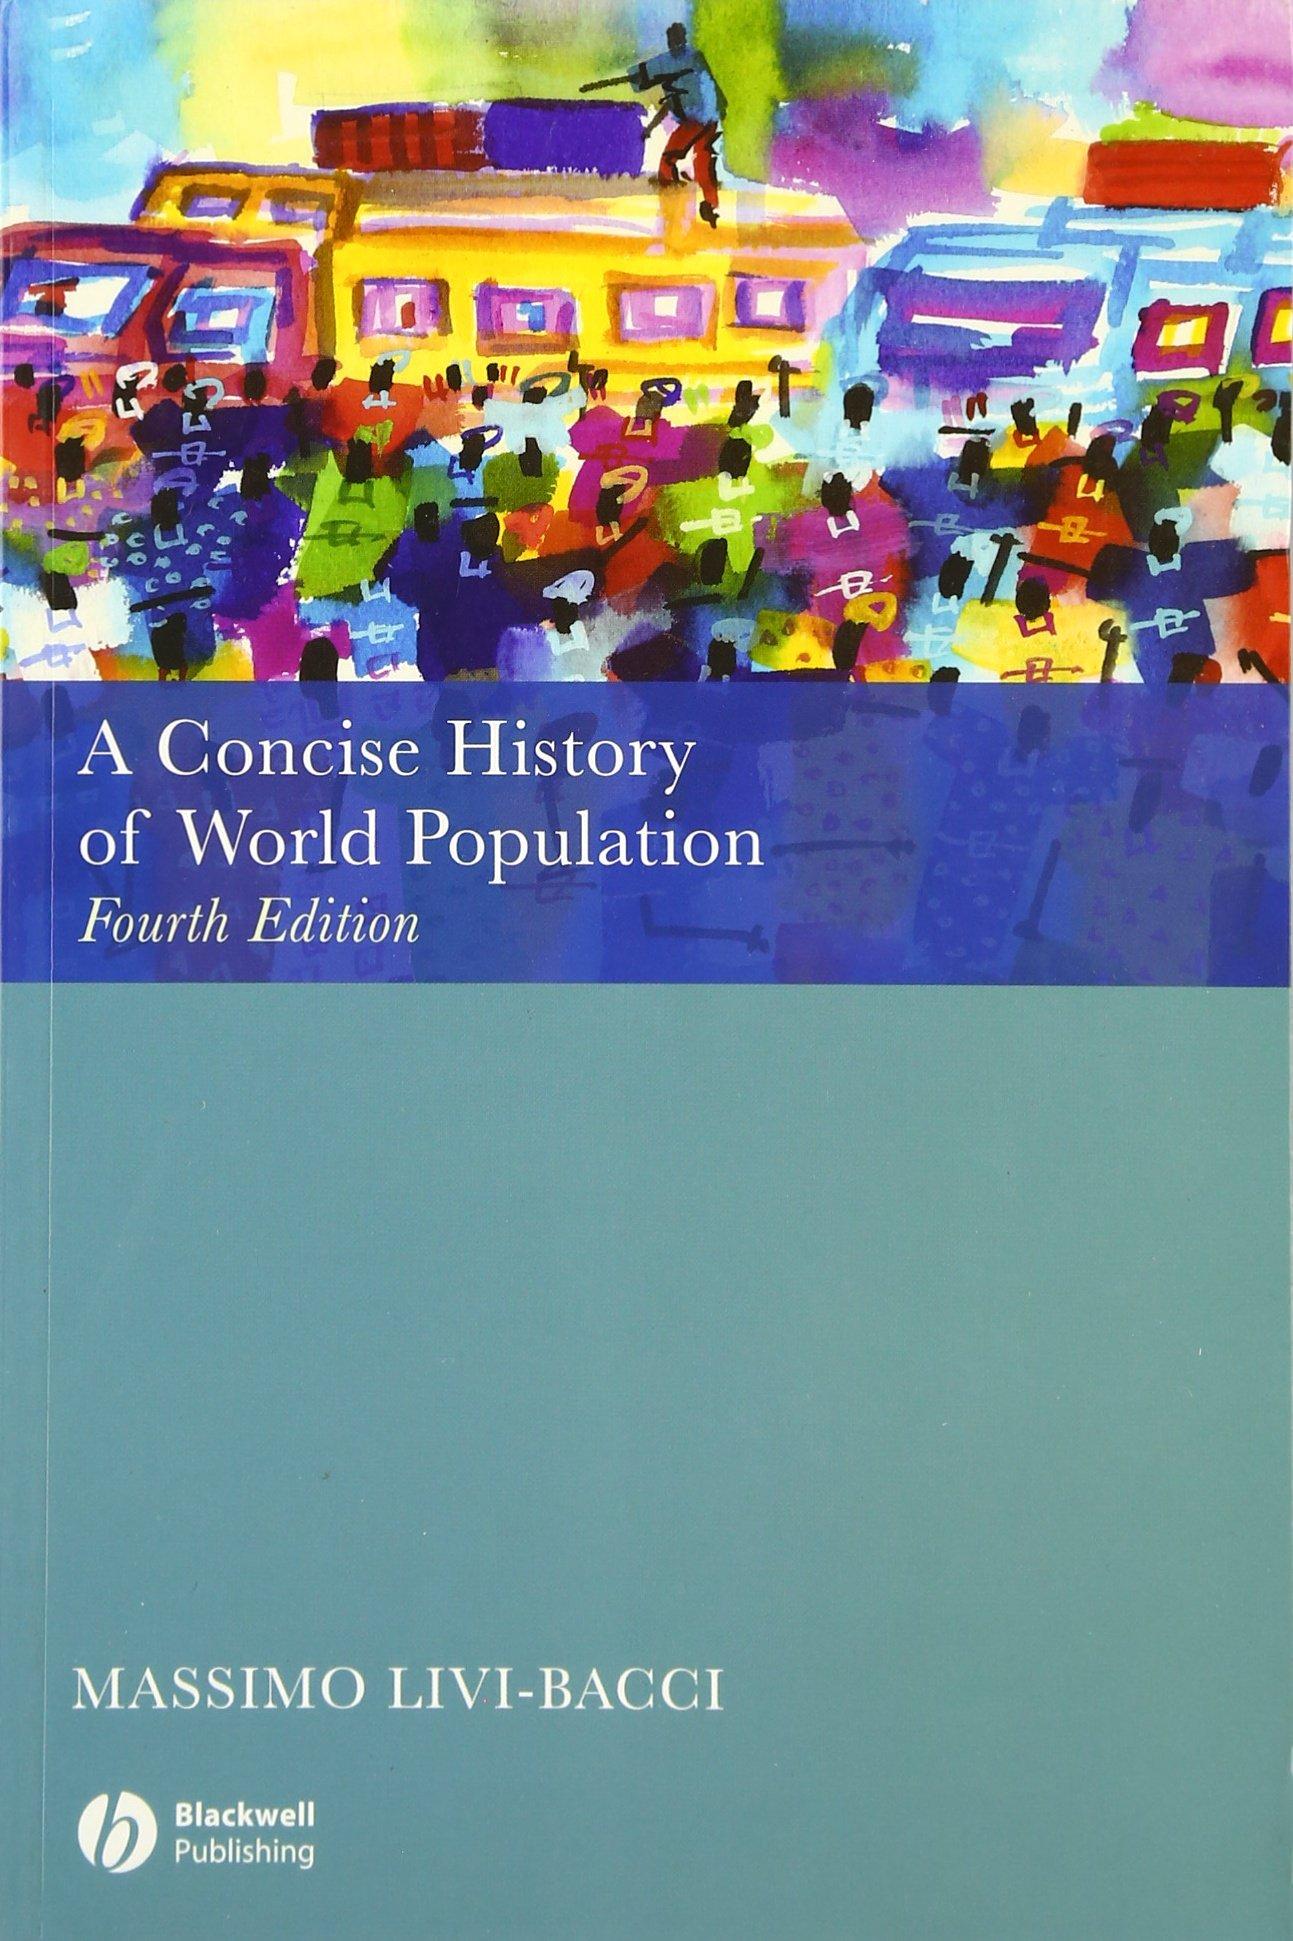 A Concise History Of World Population Massimo Livi Bacci